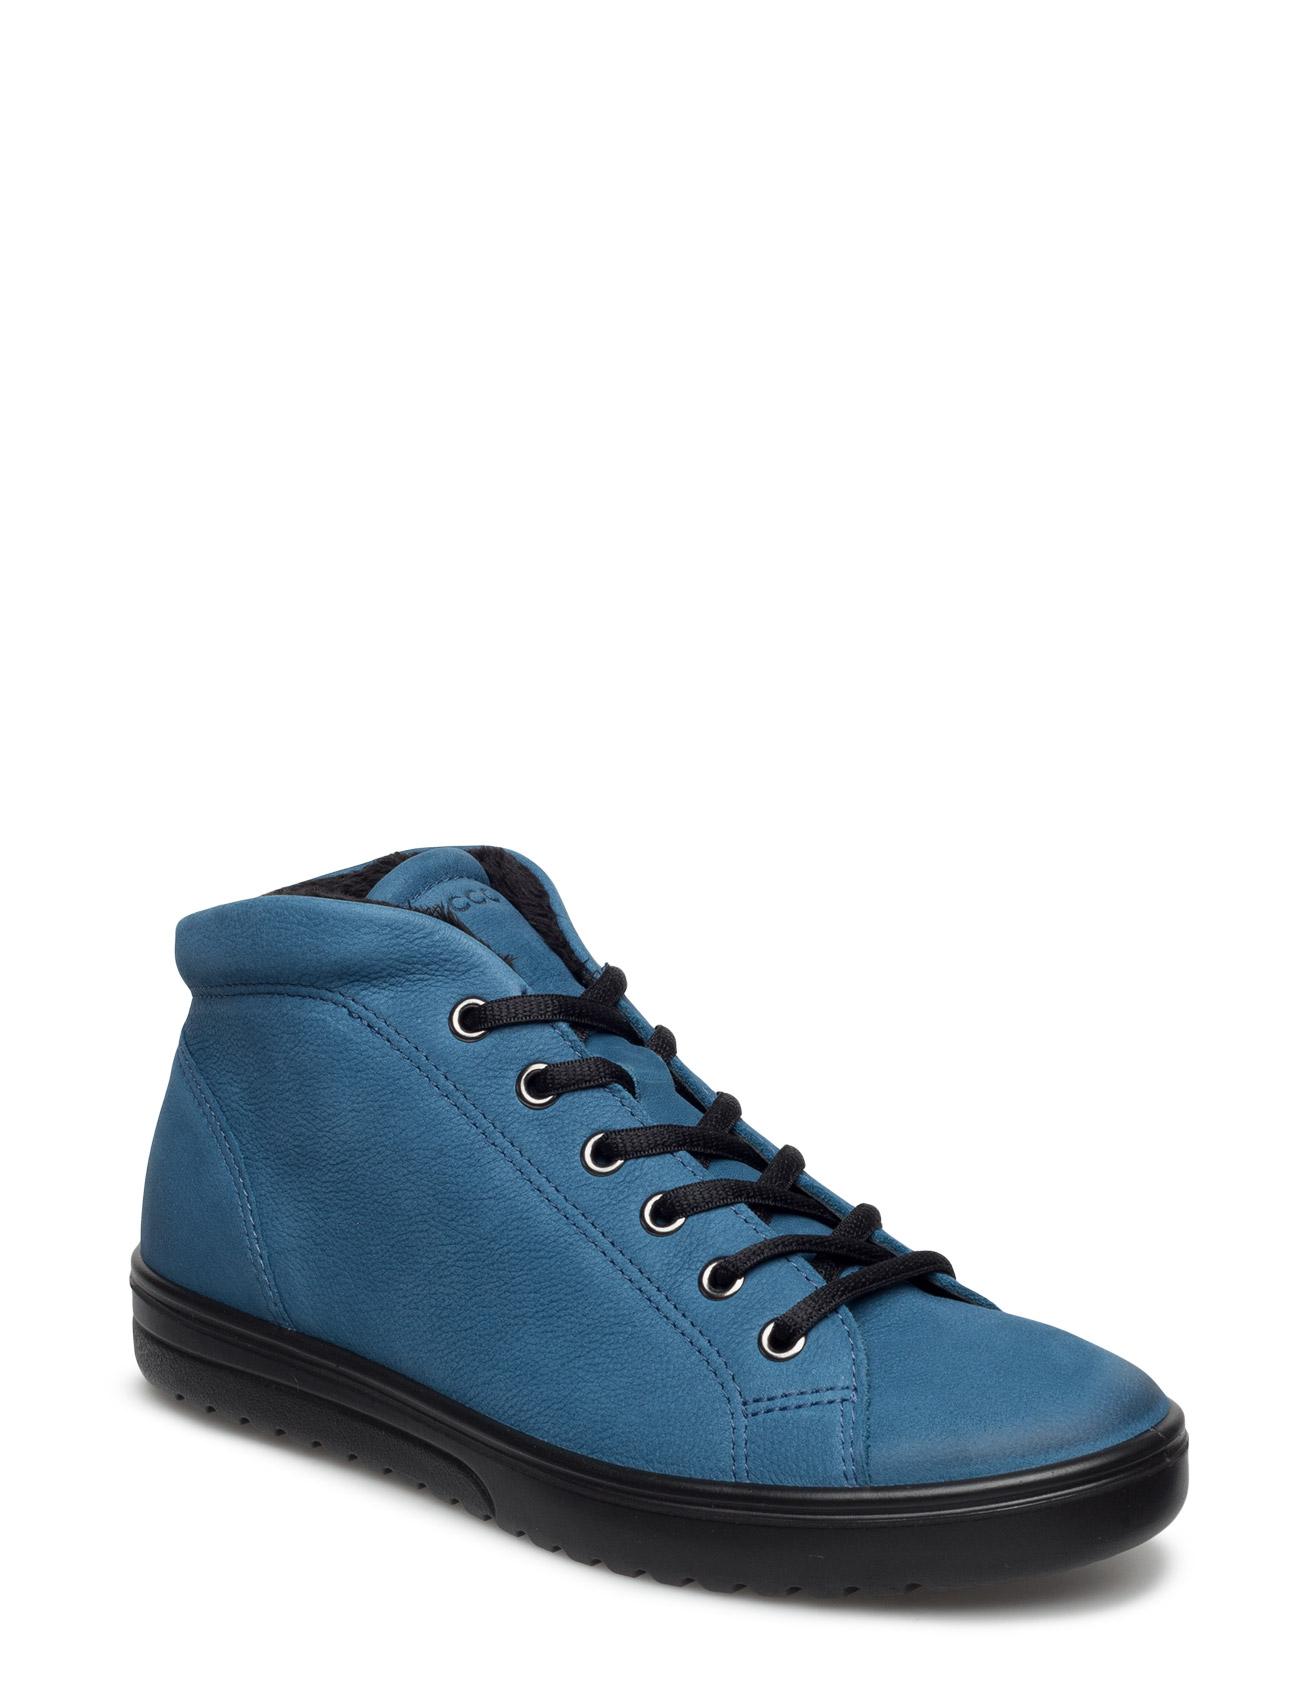 Fara ECCO Sneakers til Kvinder i Sort